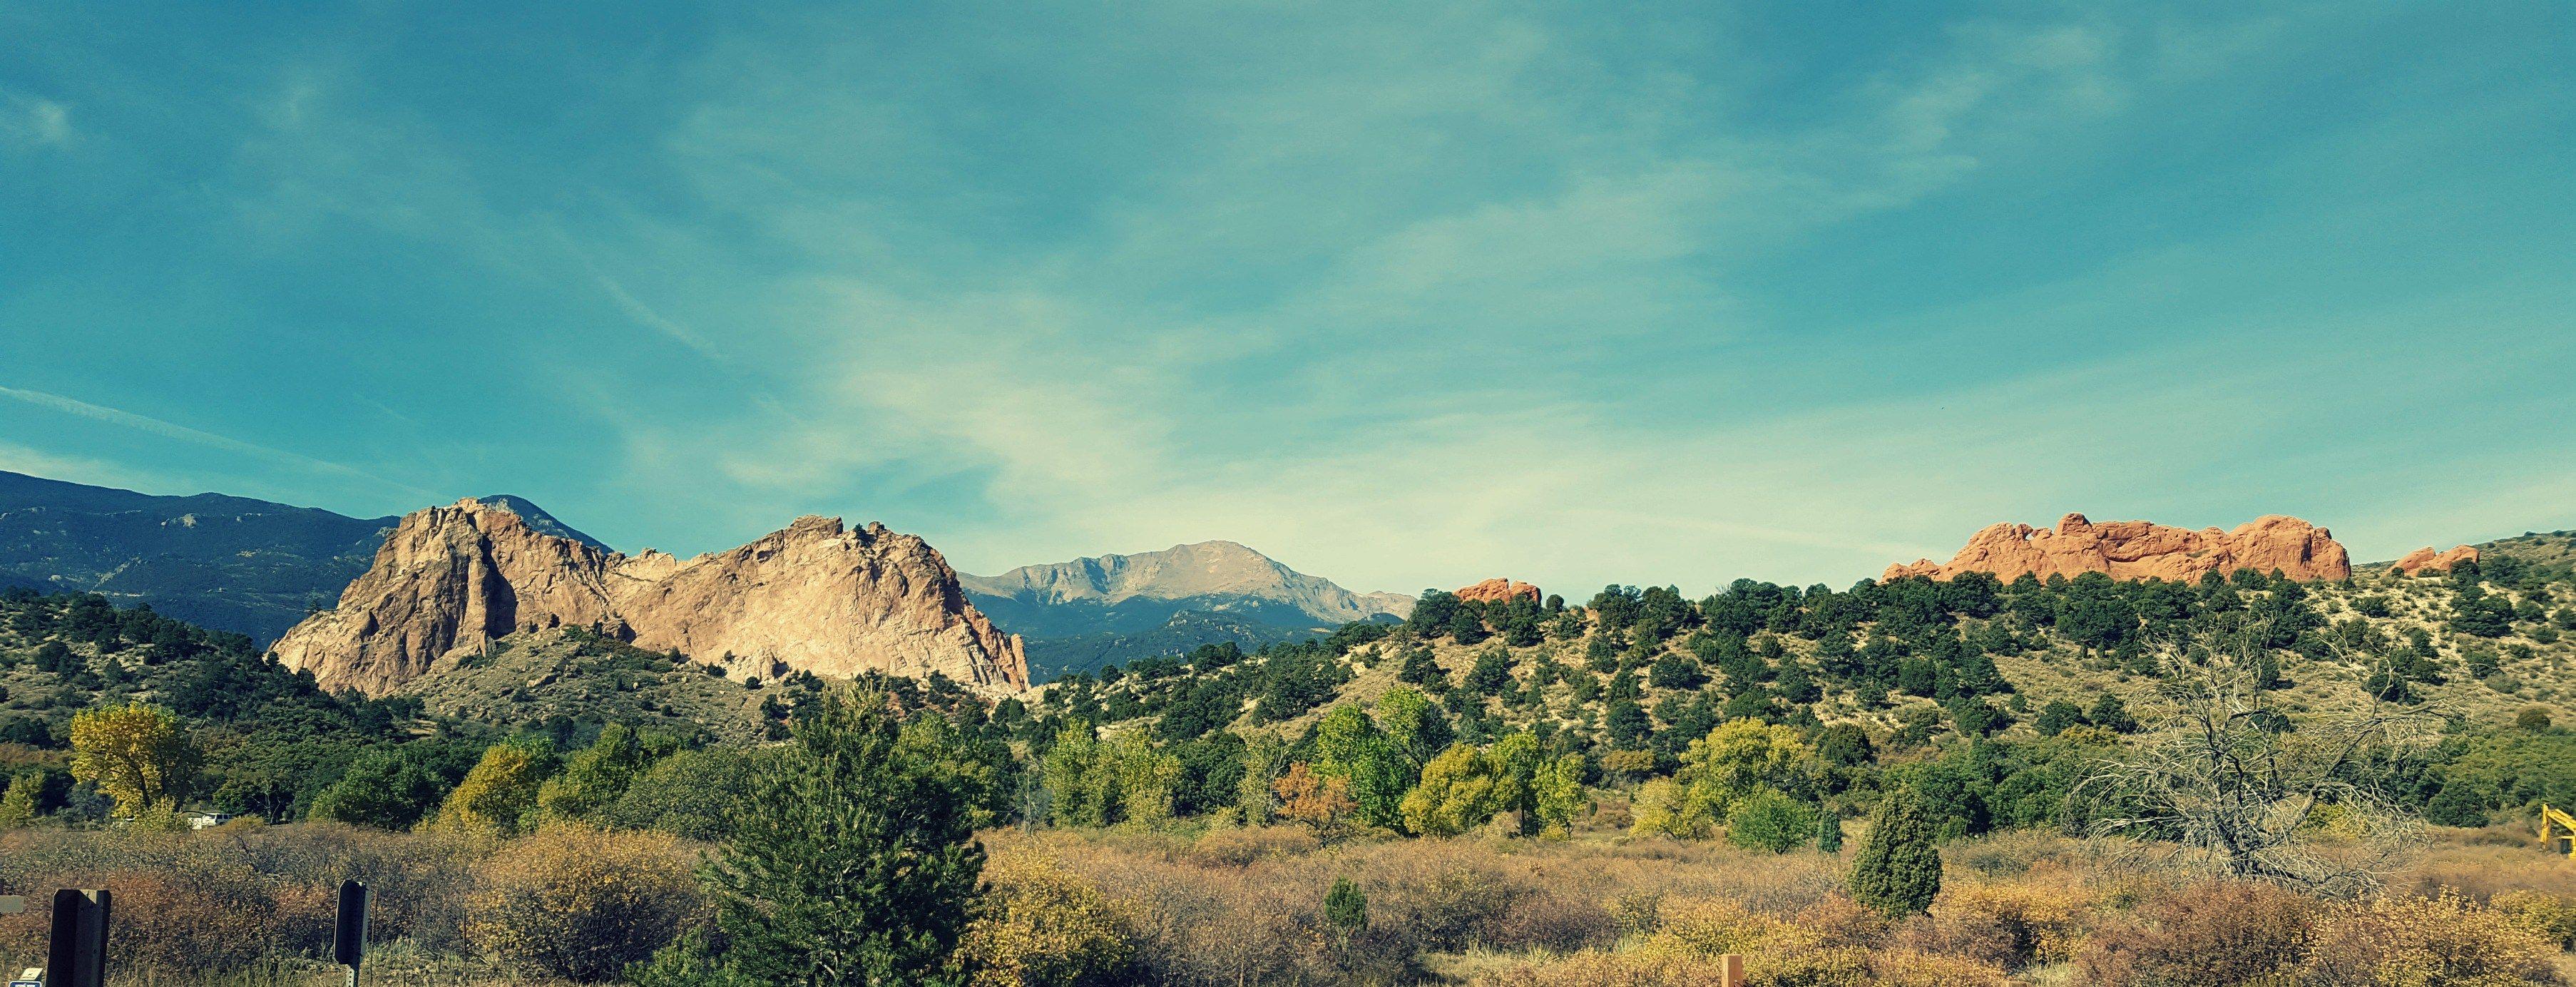 Hiking adventures garden of the gods in colorado springs